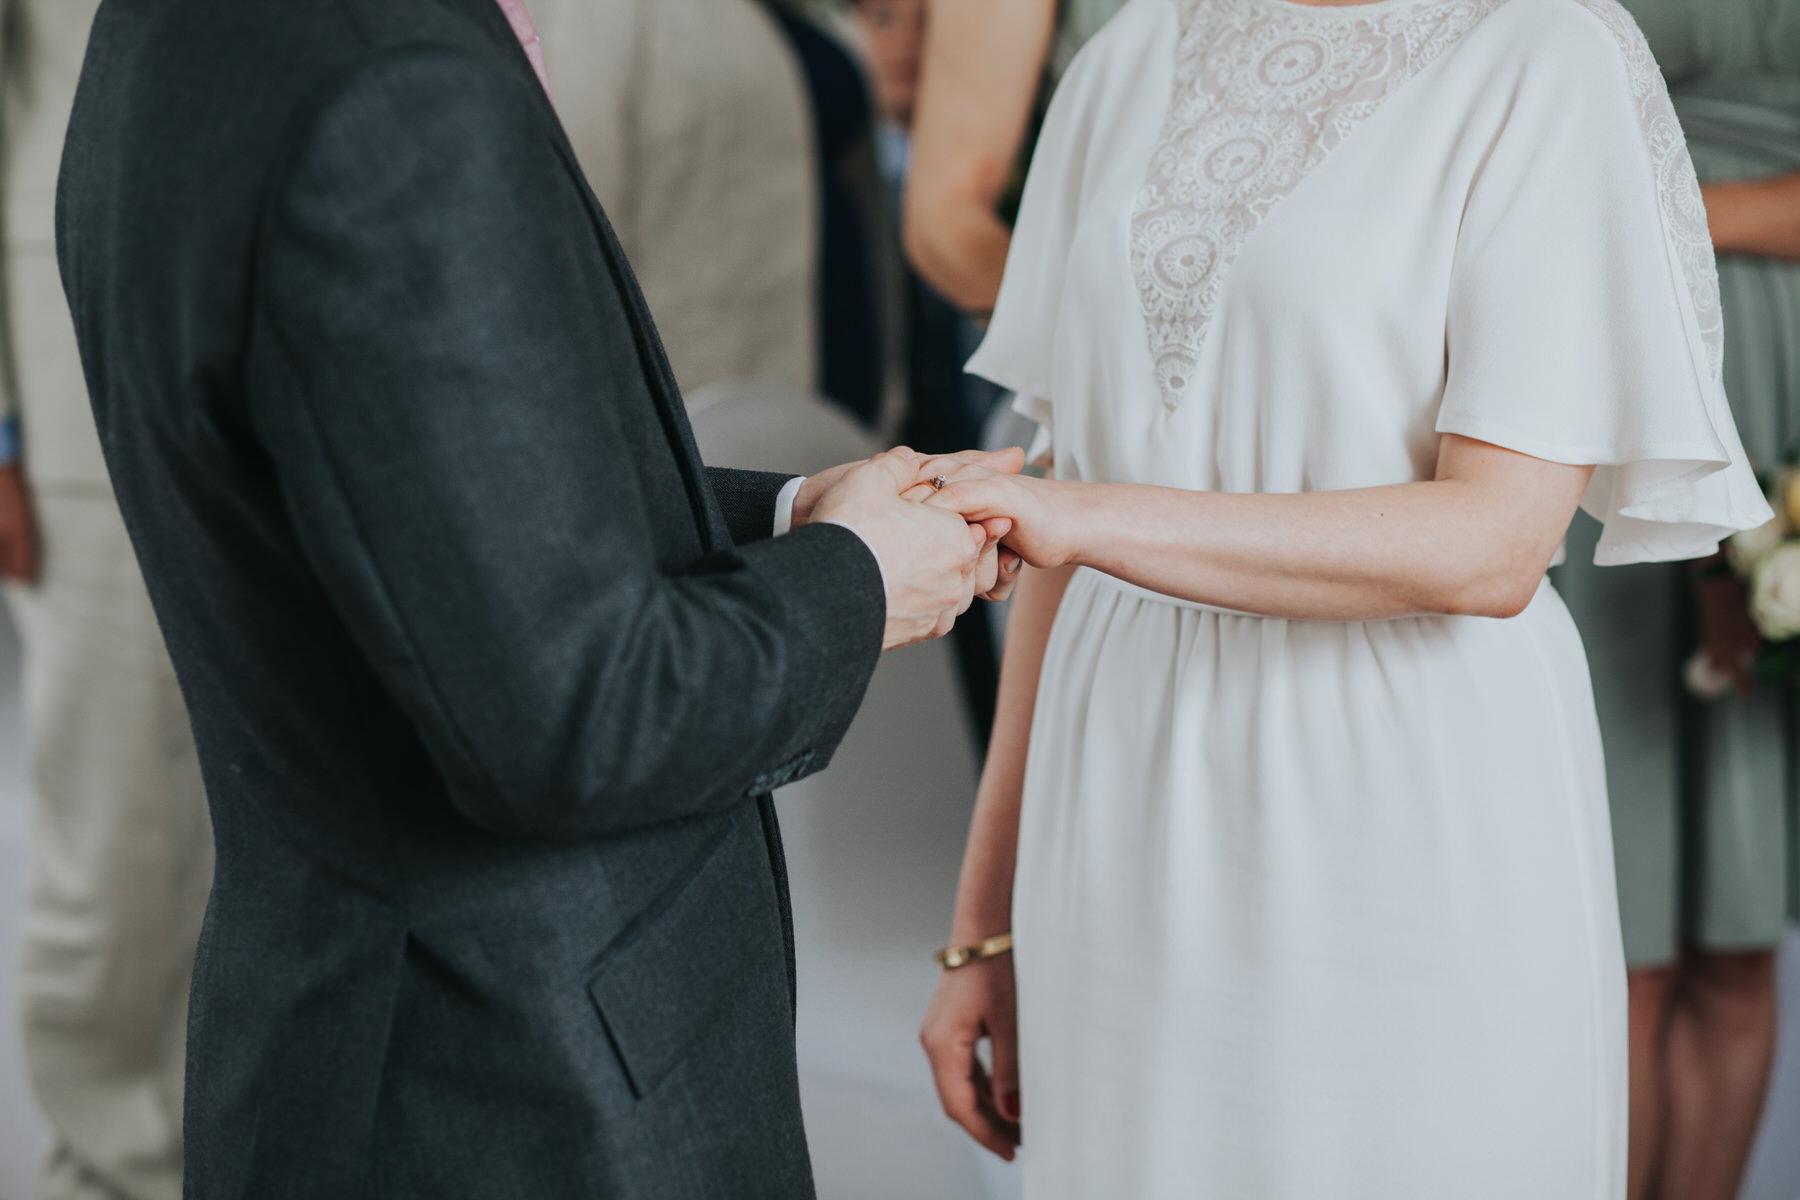 102 groom places wedding ring brides finger.jpg